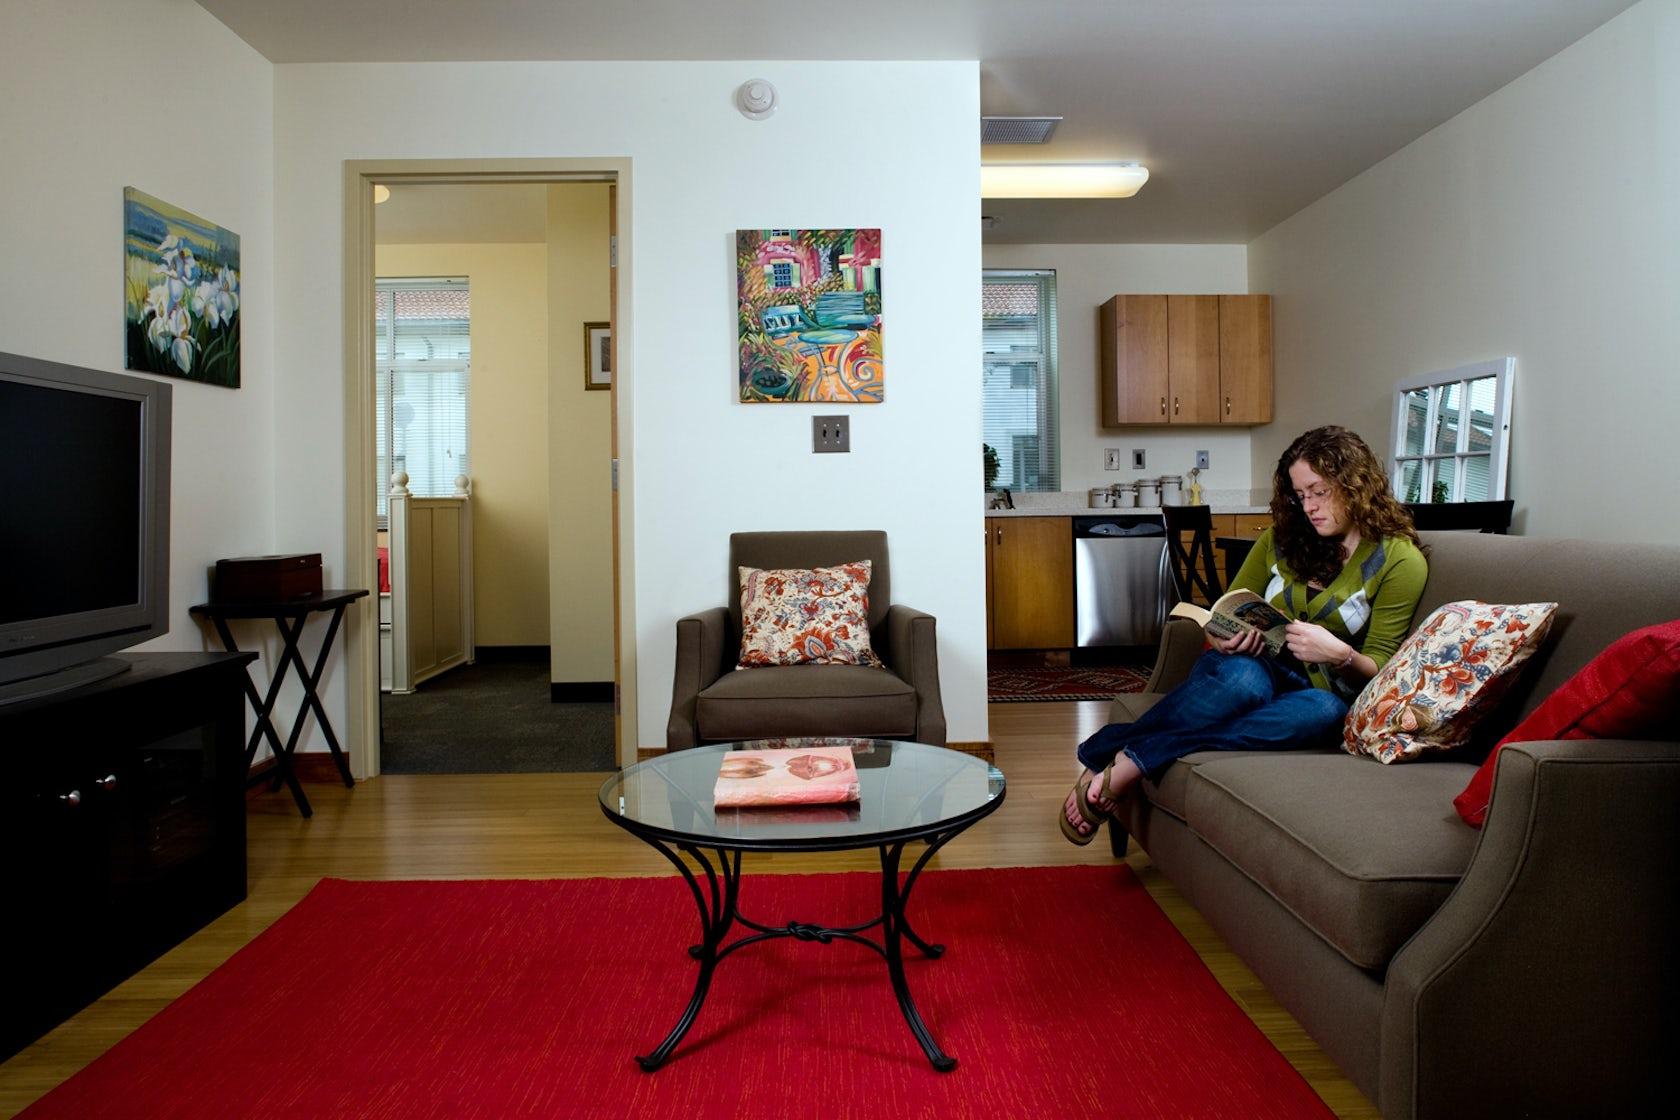 University Of Maryland Nursing >> Emory University - Turman Residence Hall - Architizer